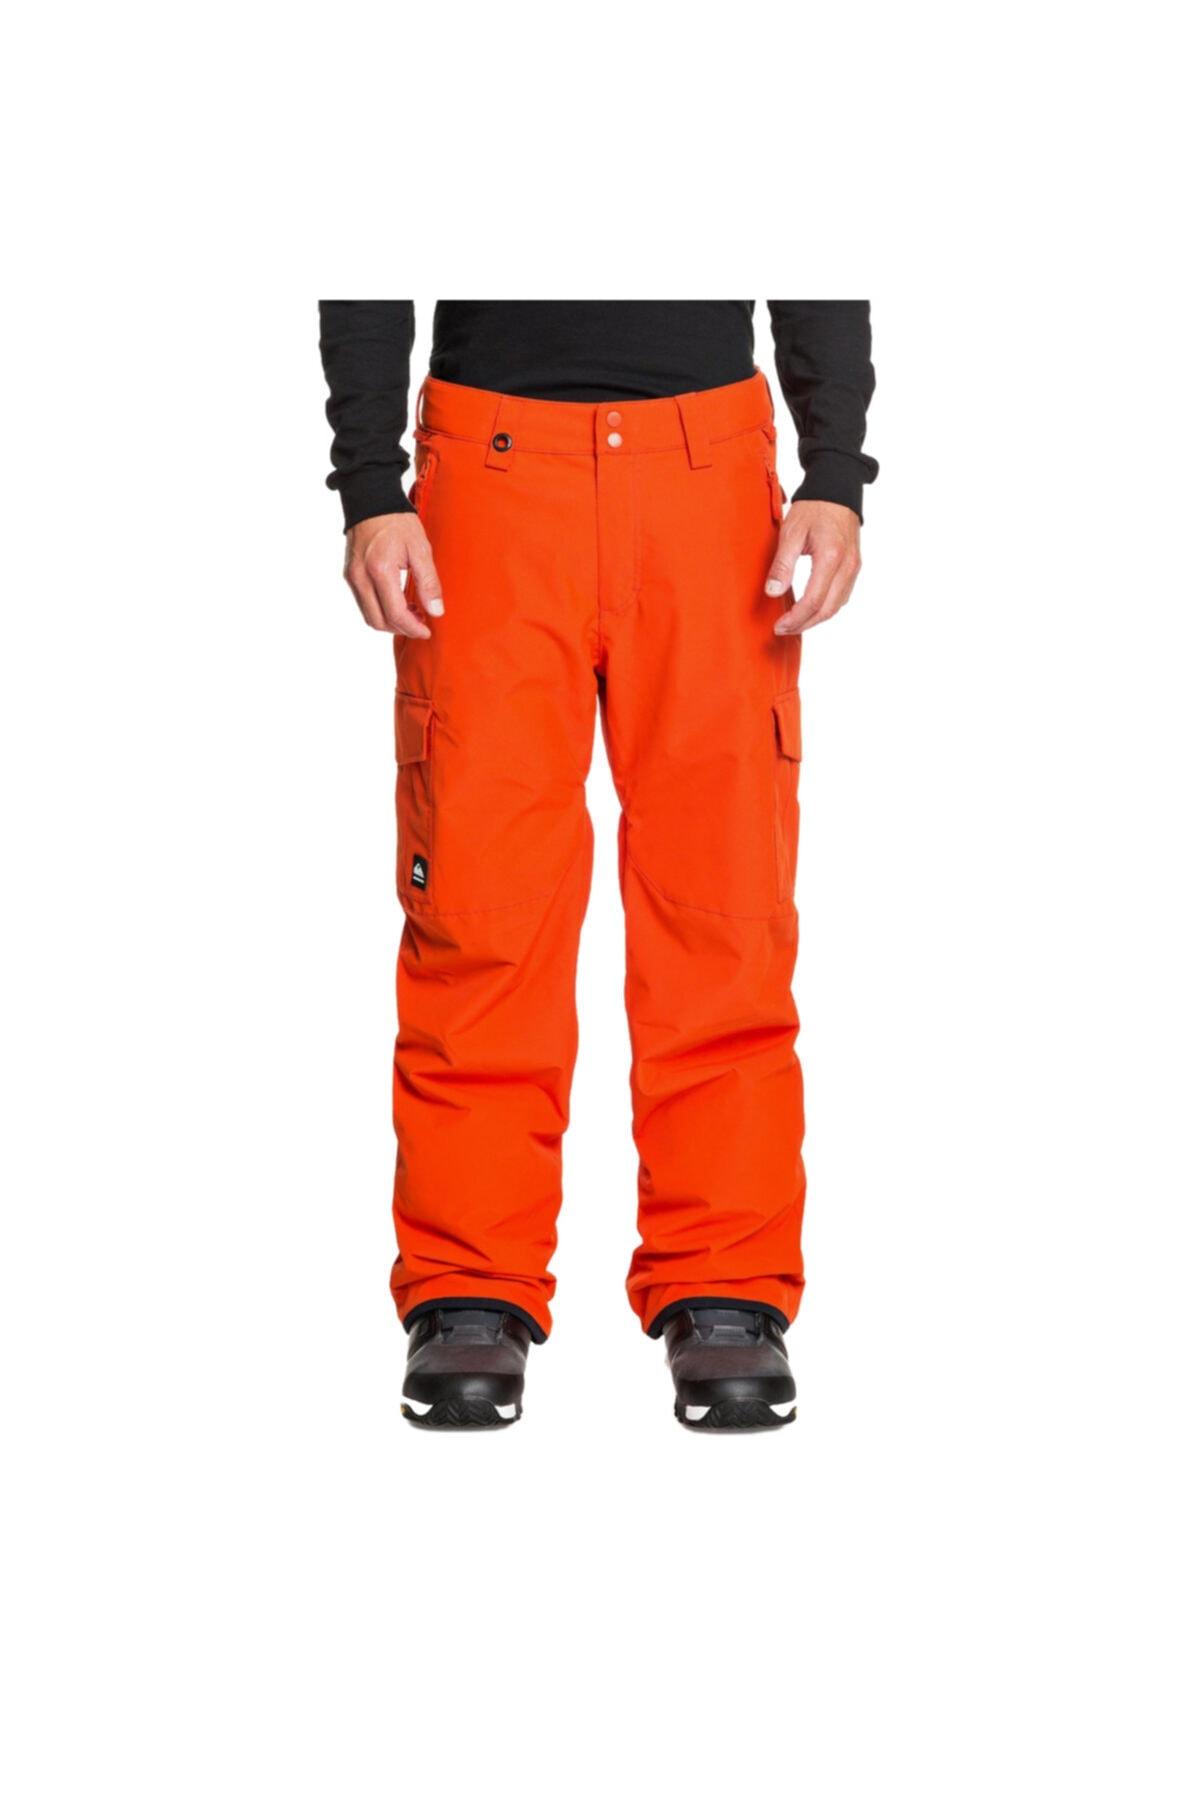 Quiksilver Quıksılver Porter Erkek Snowboard Pantolonu 1